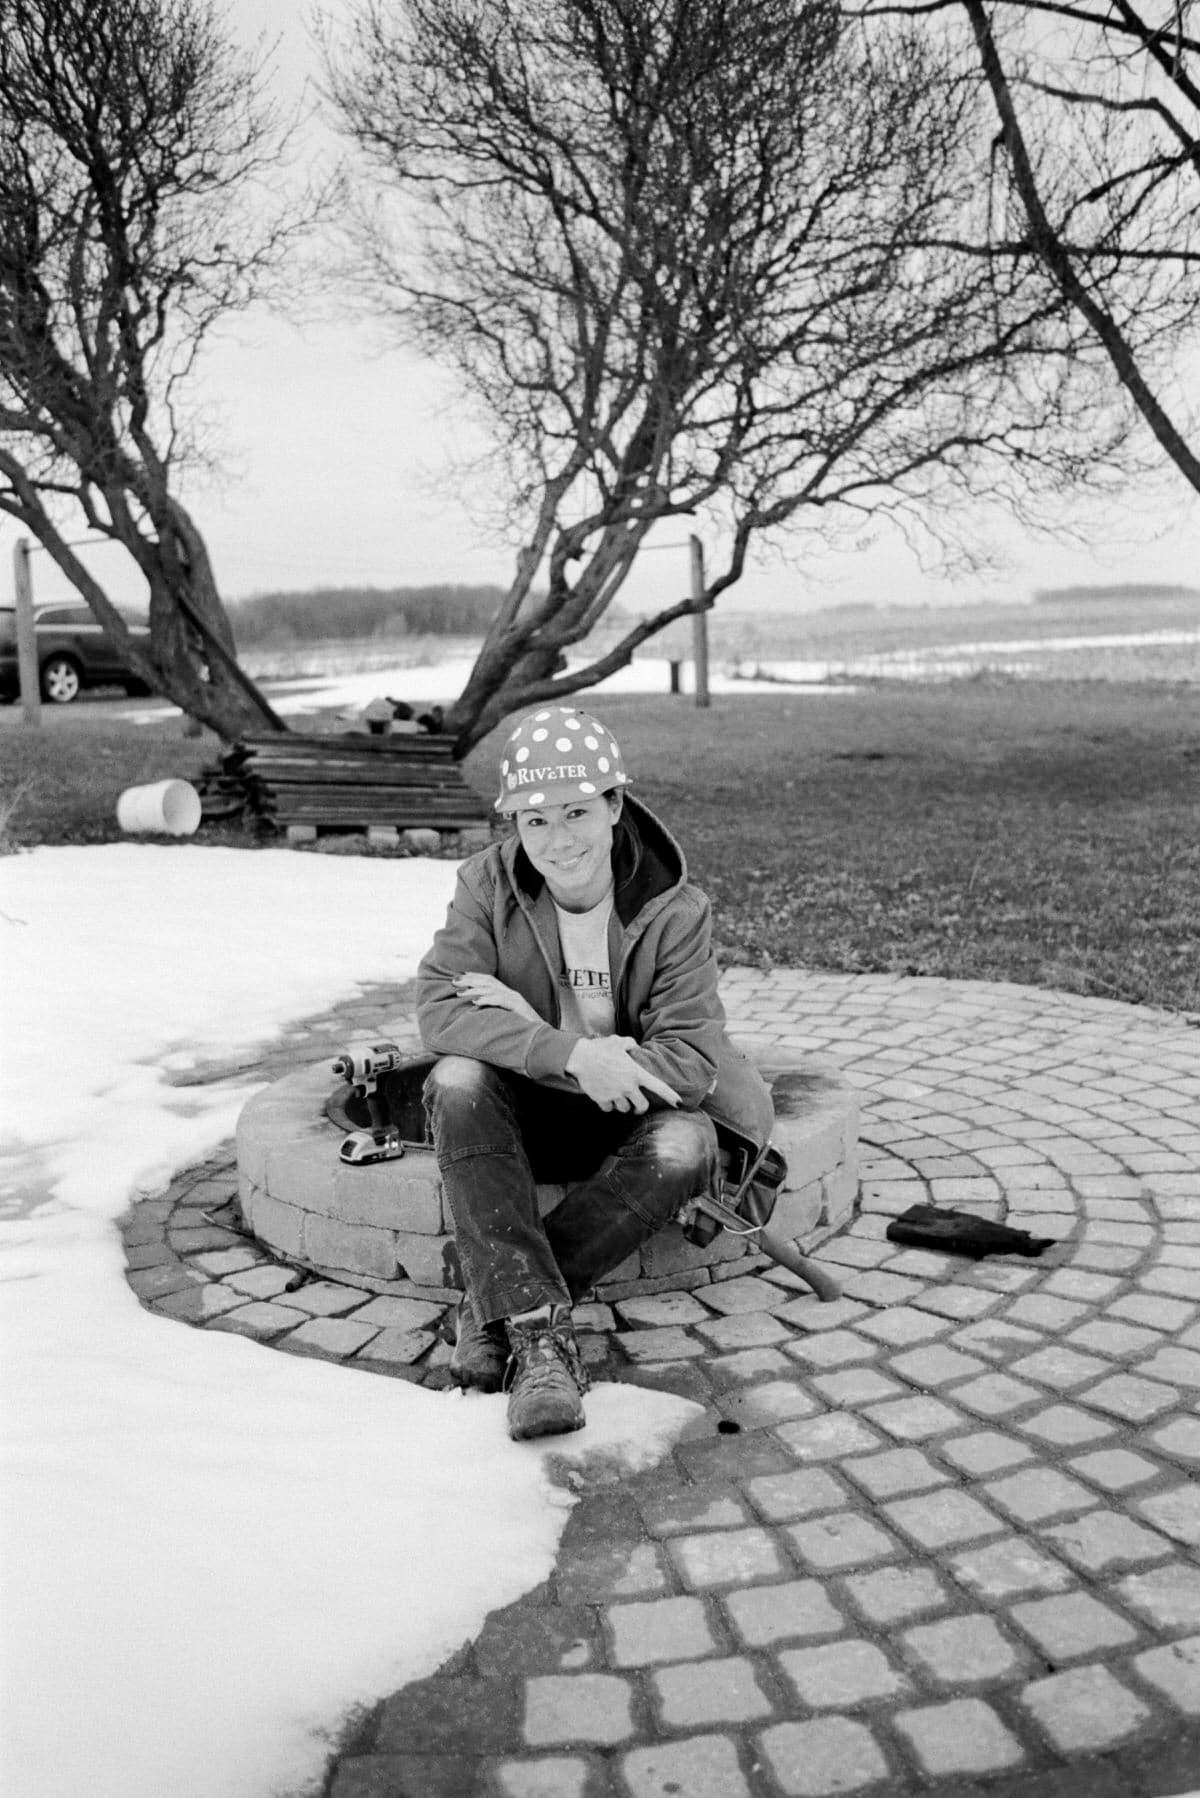 Illuminating-Women-art-exhibition-black-and-white-fine-art-film-photography-by-Studio-L-photographer-Laura-Schneider-10033